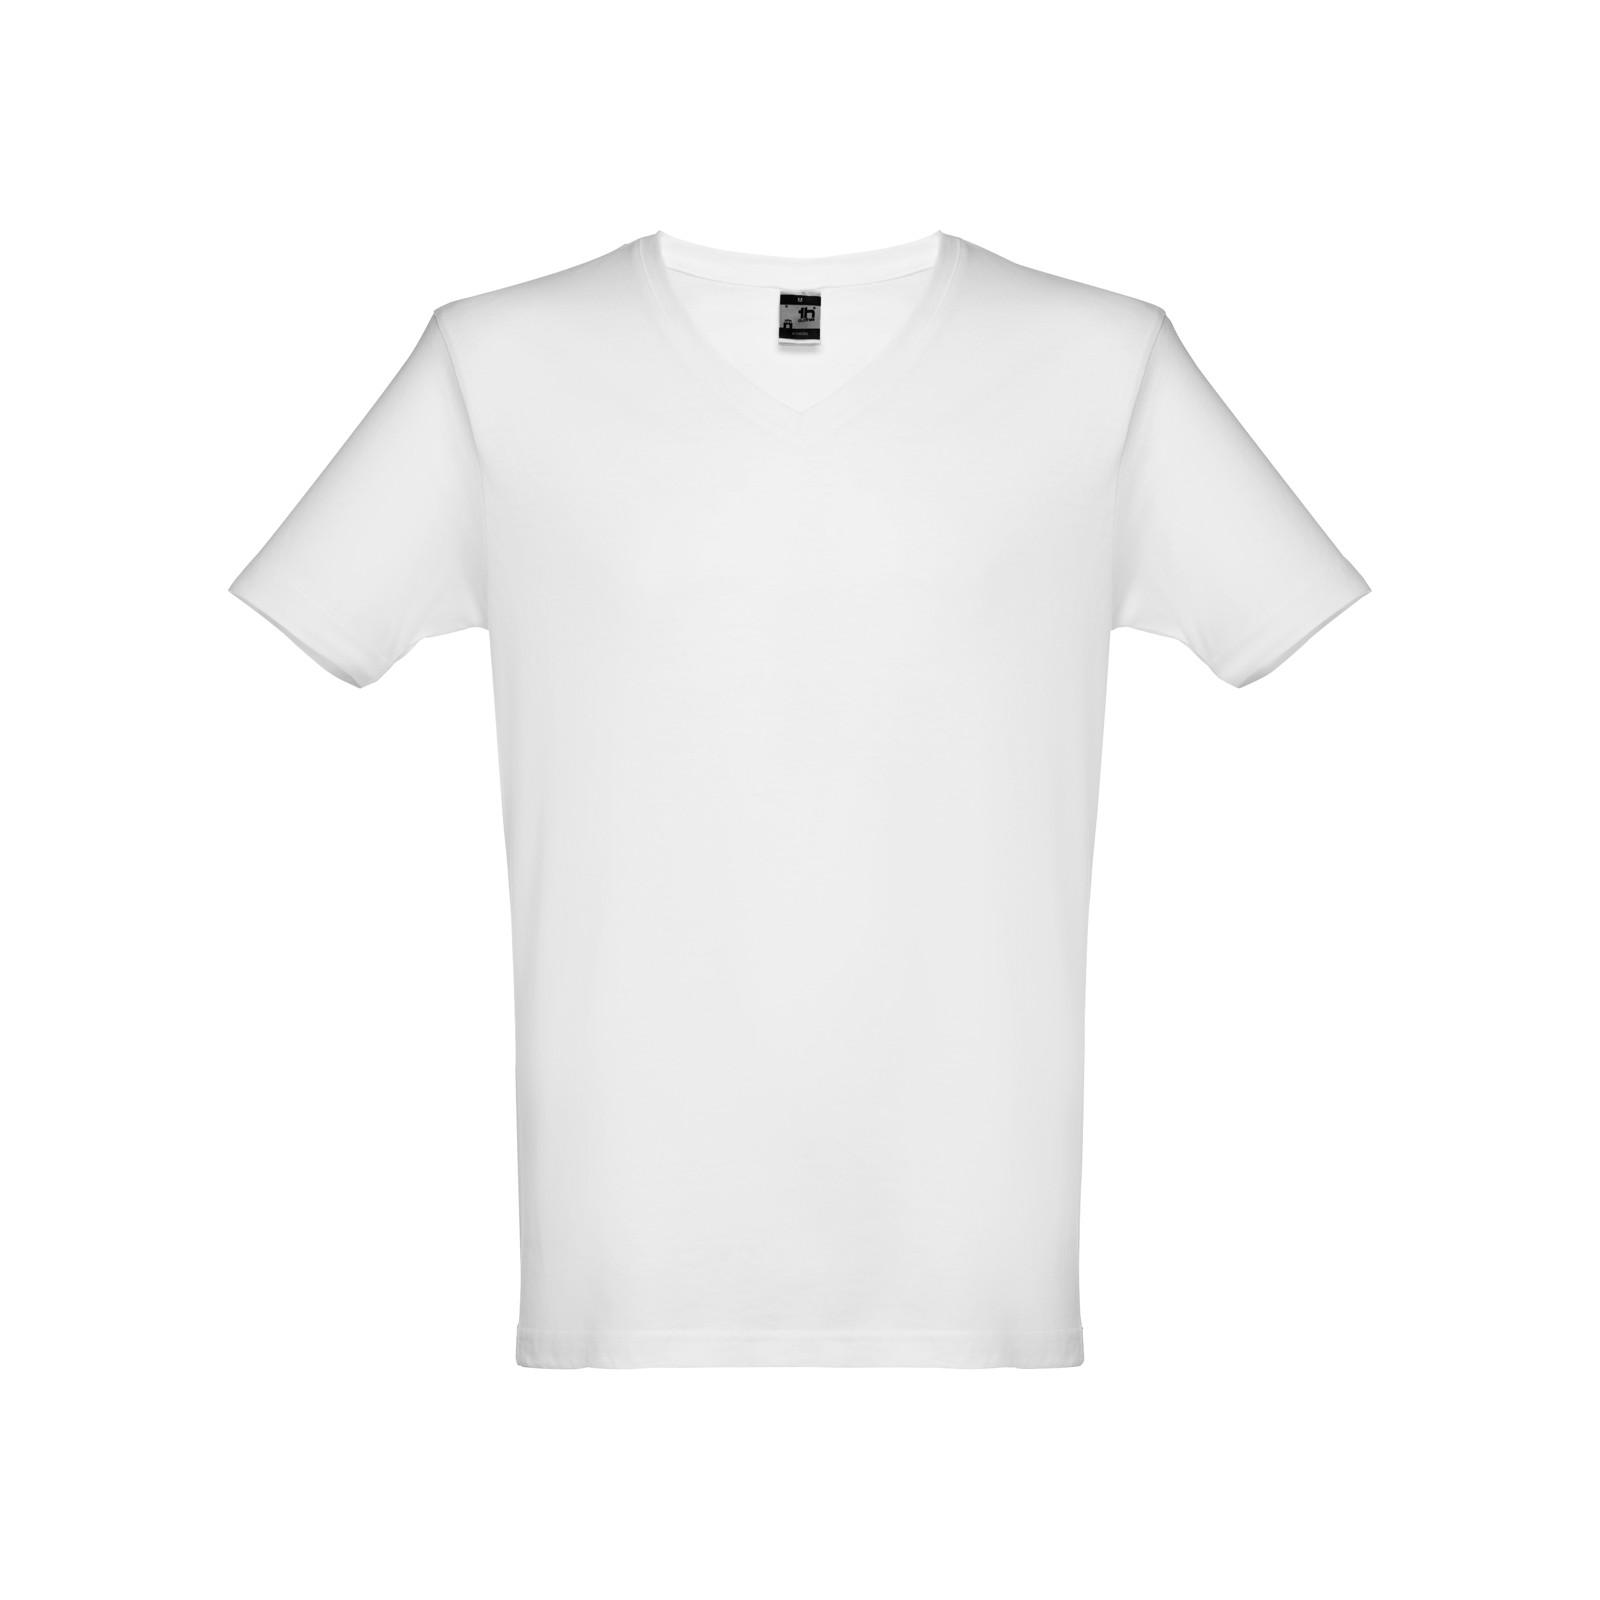 THC ATHENS WH. Pánské tričko - Bílá / S